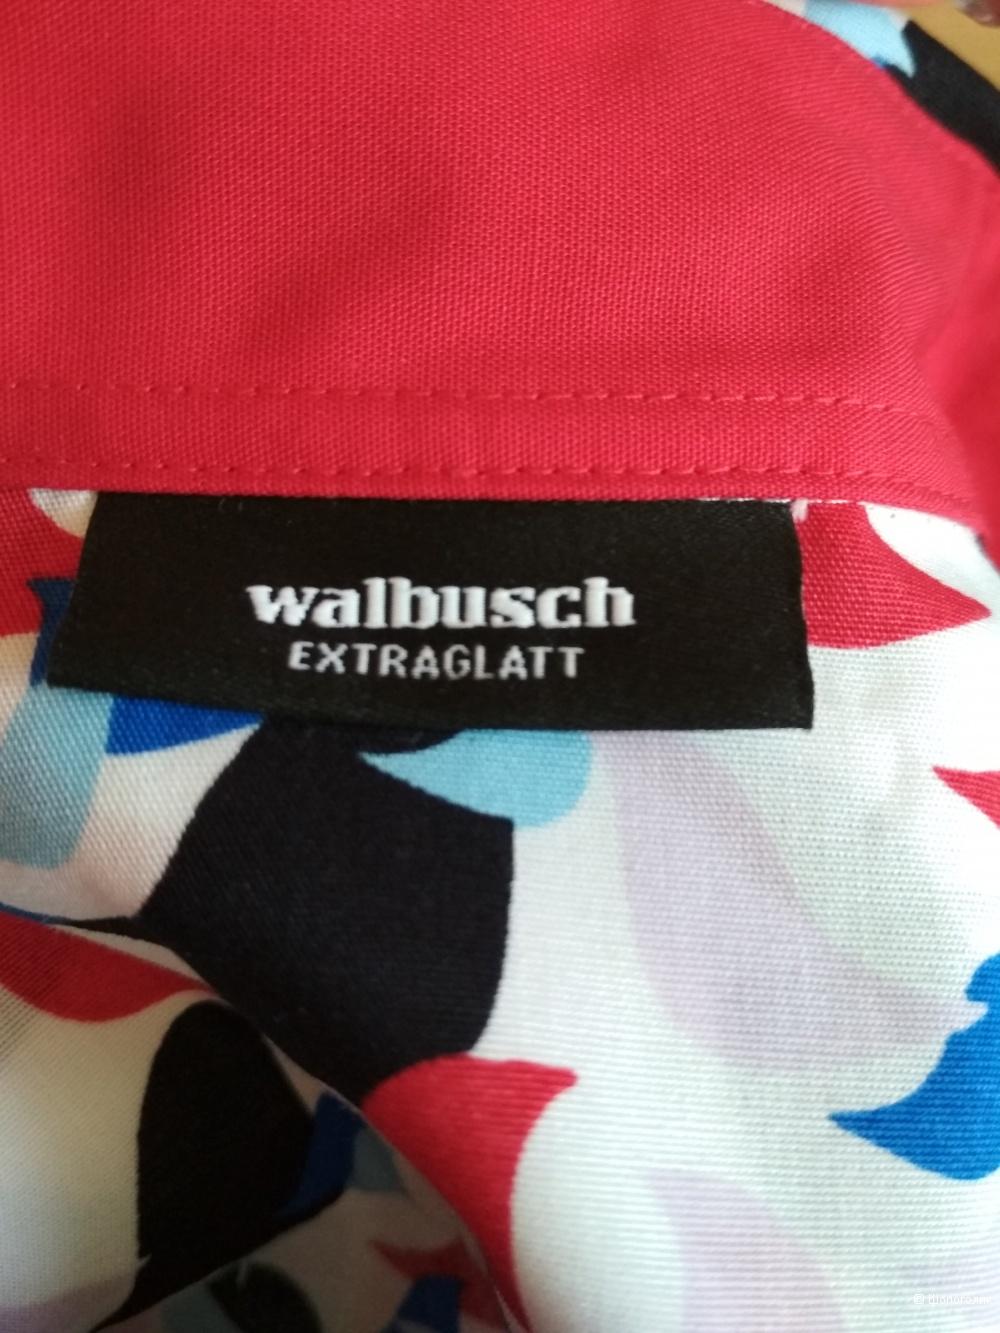 Рубашка Walbusch exctraglatt, р. 46-48